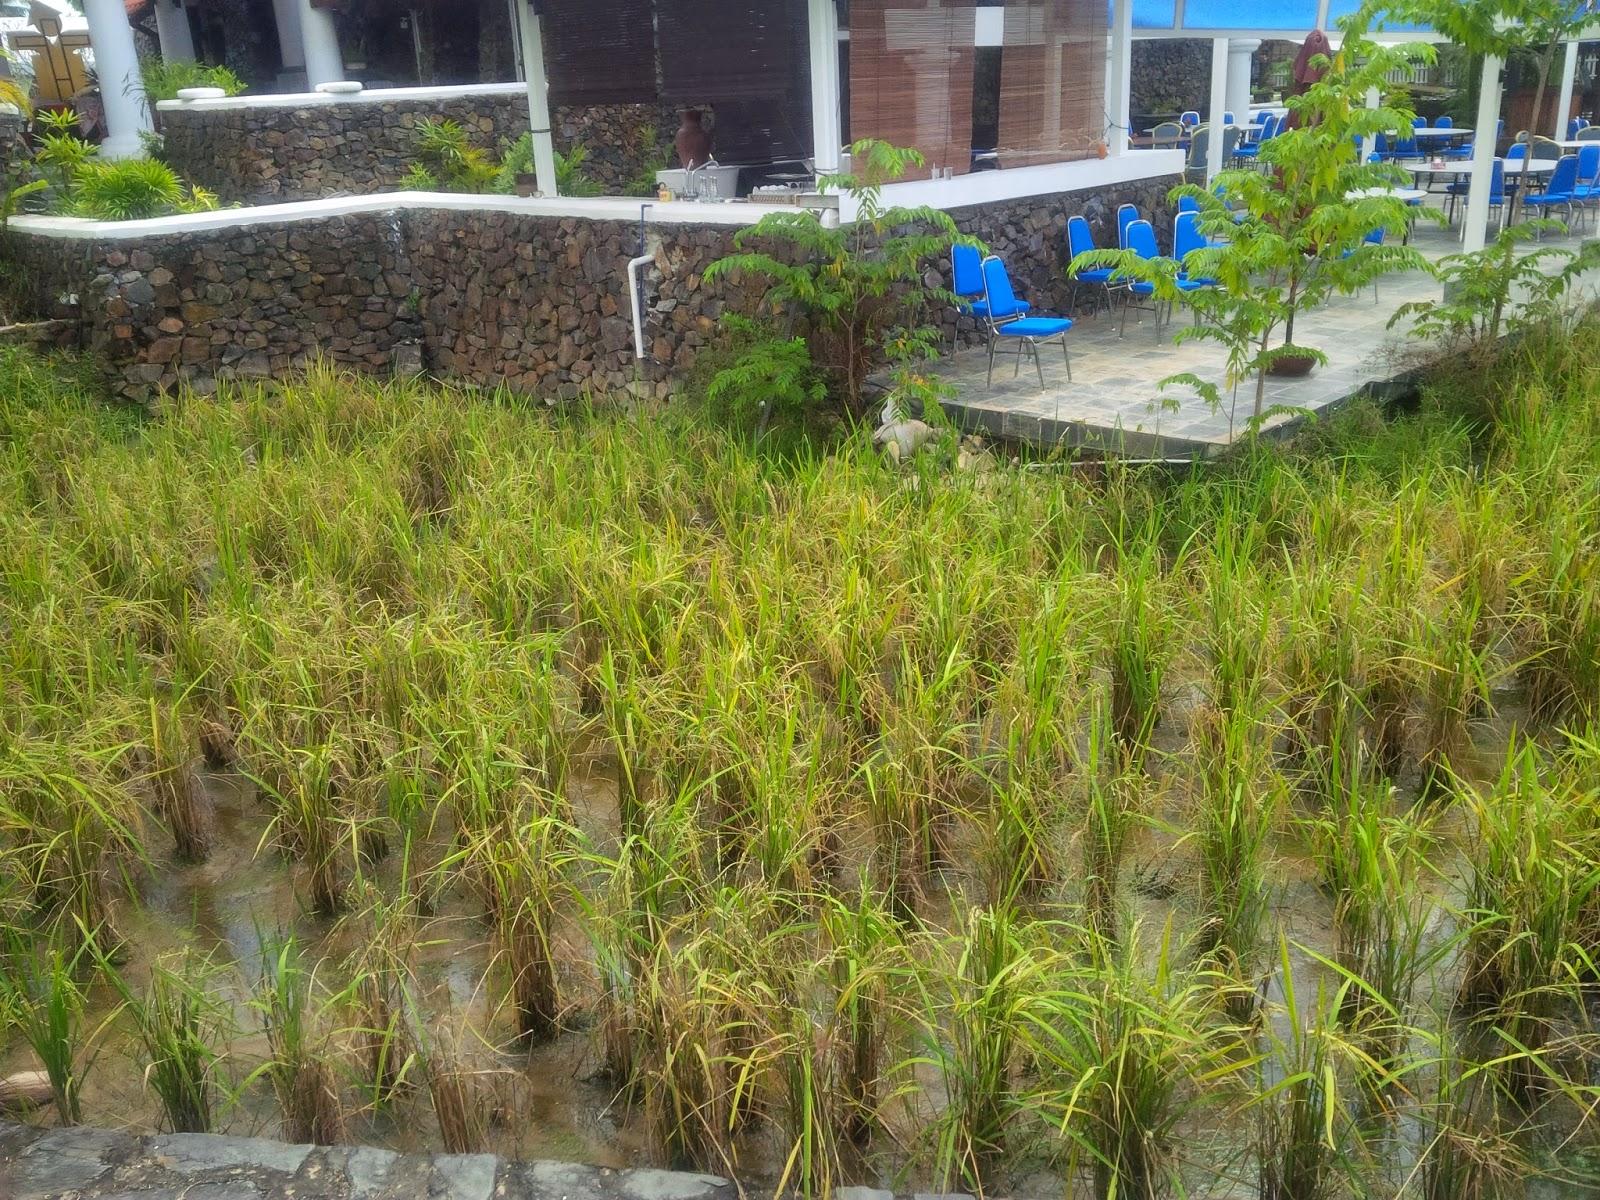 agroturism, beach, gardening, how to grow rice, Laman Padi, Langkawi, Museum, pantai cenang, Rice Garden, tourism, travel